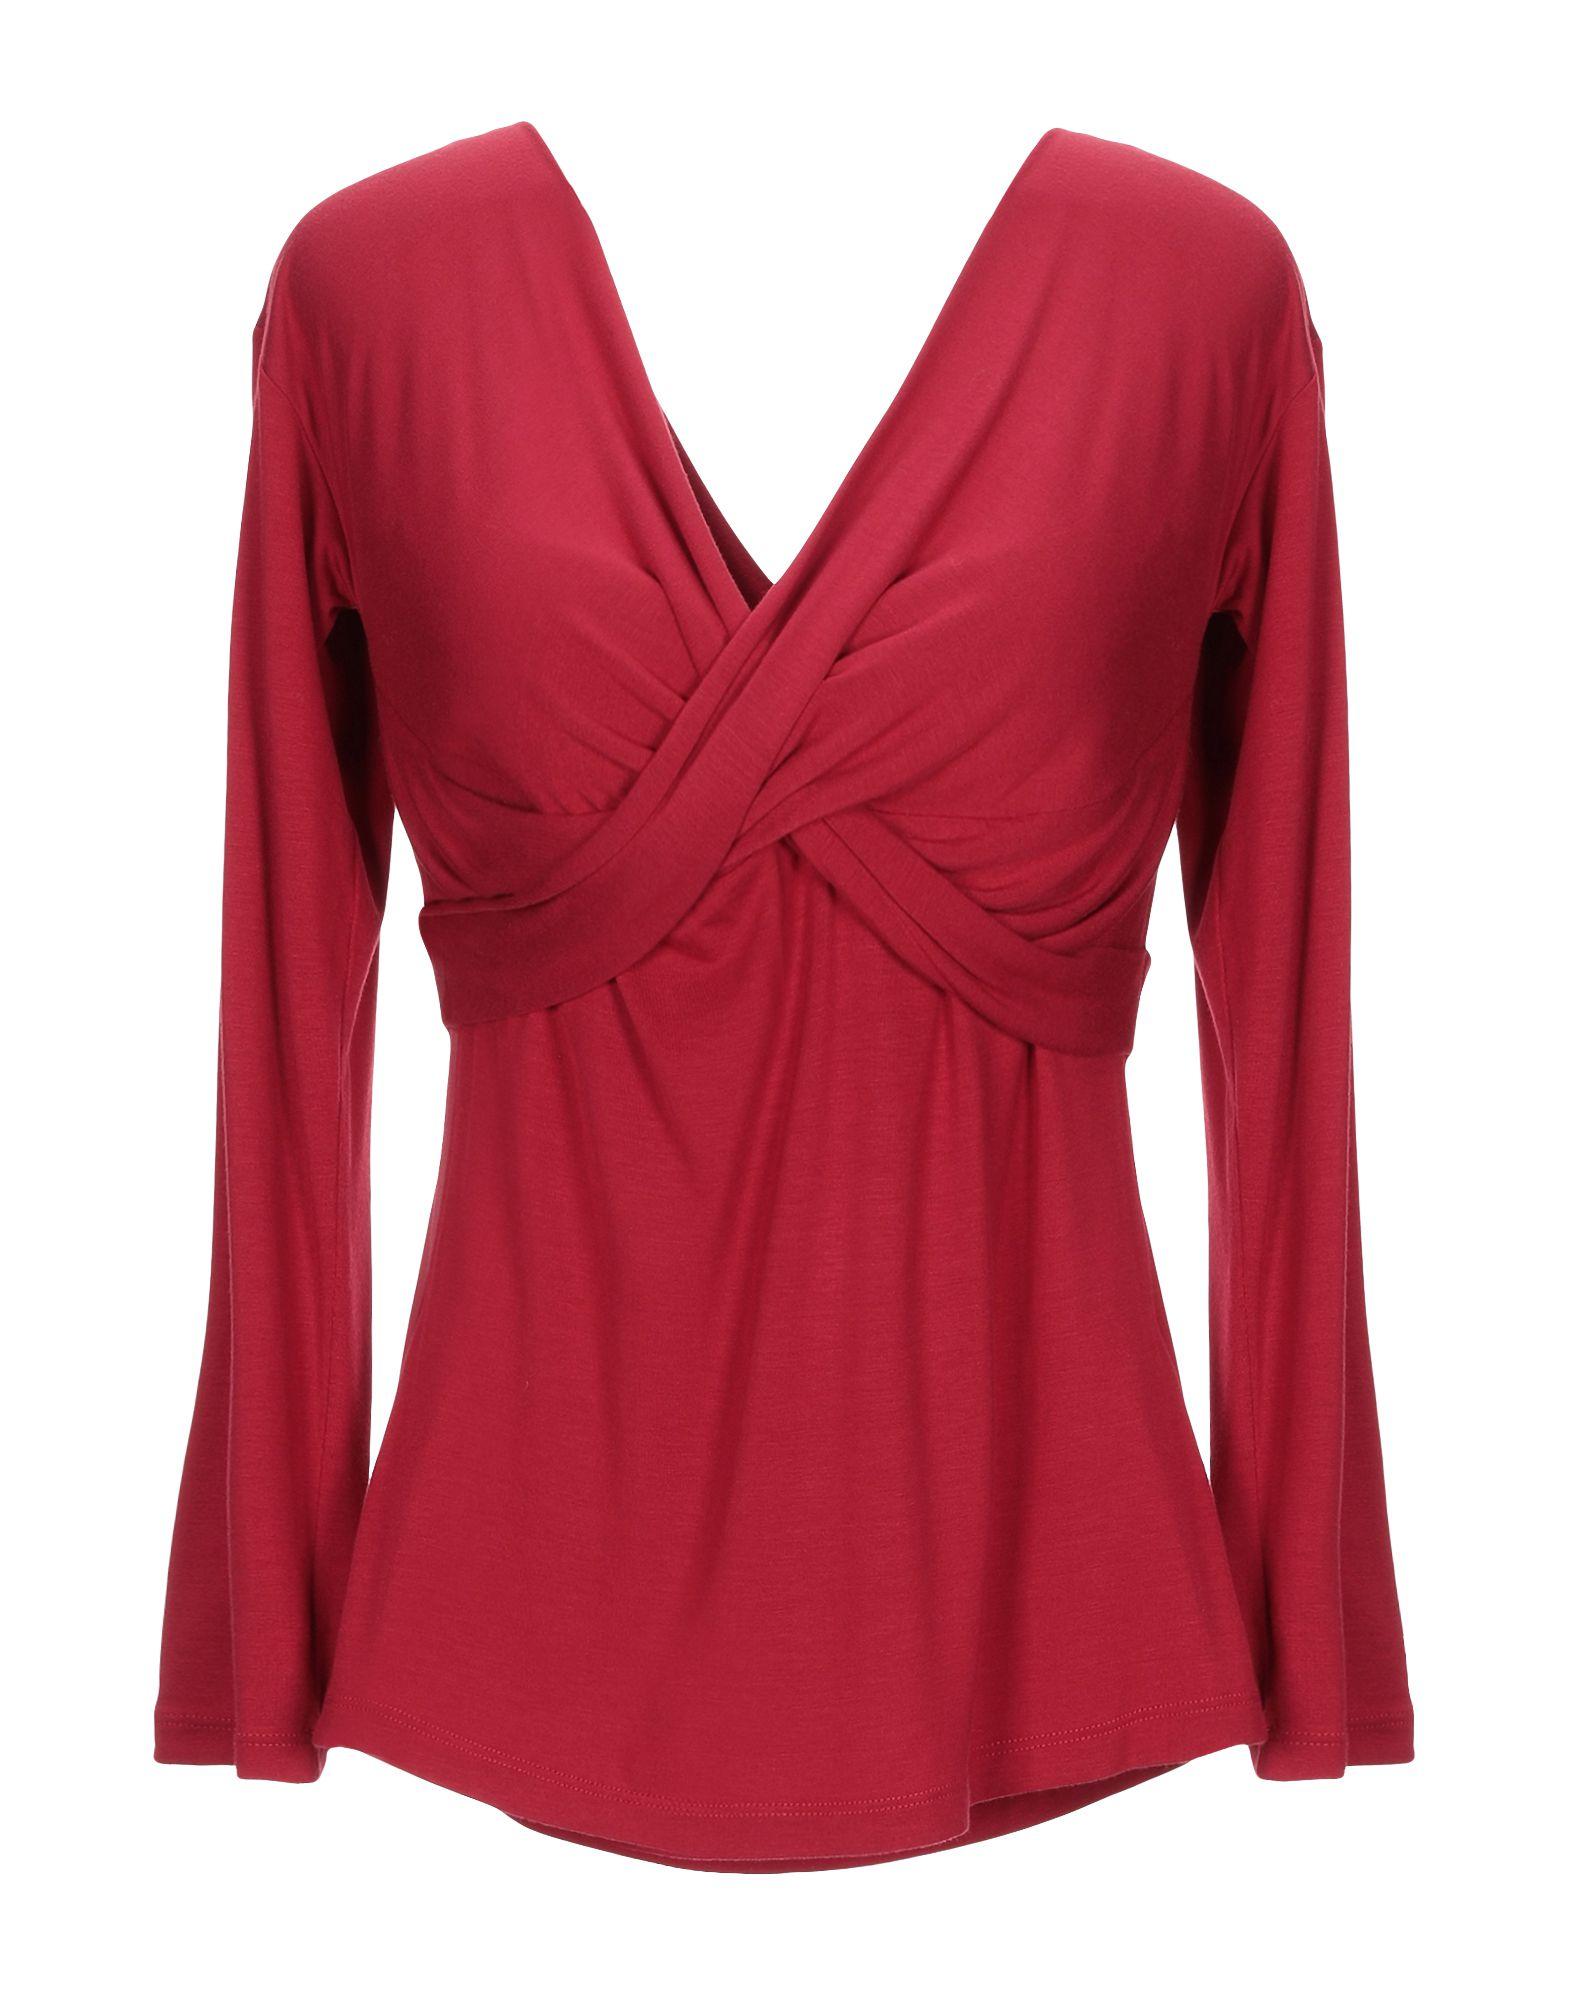 ANNA RACHELE Damen T-shirts Farbe Rot Größe 5